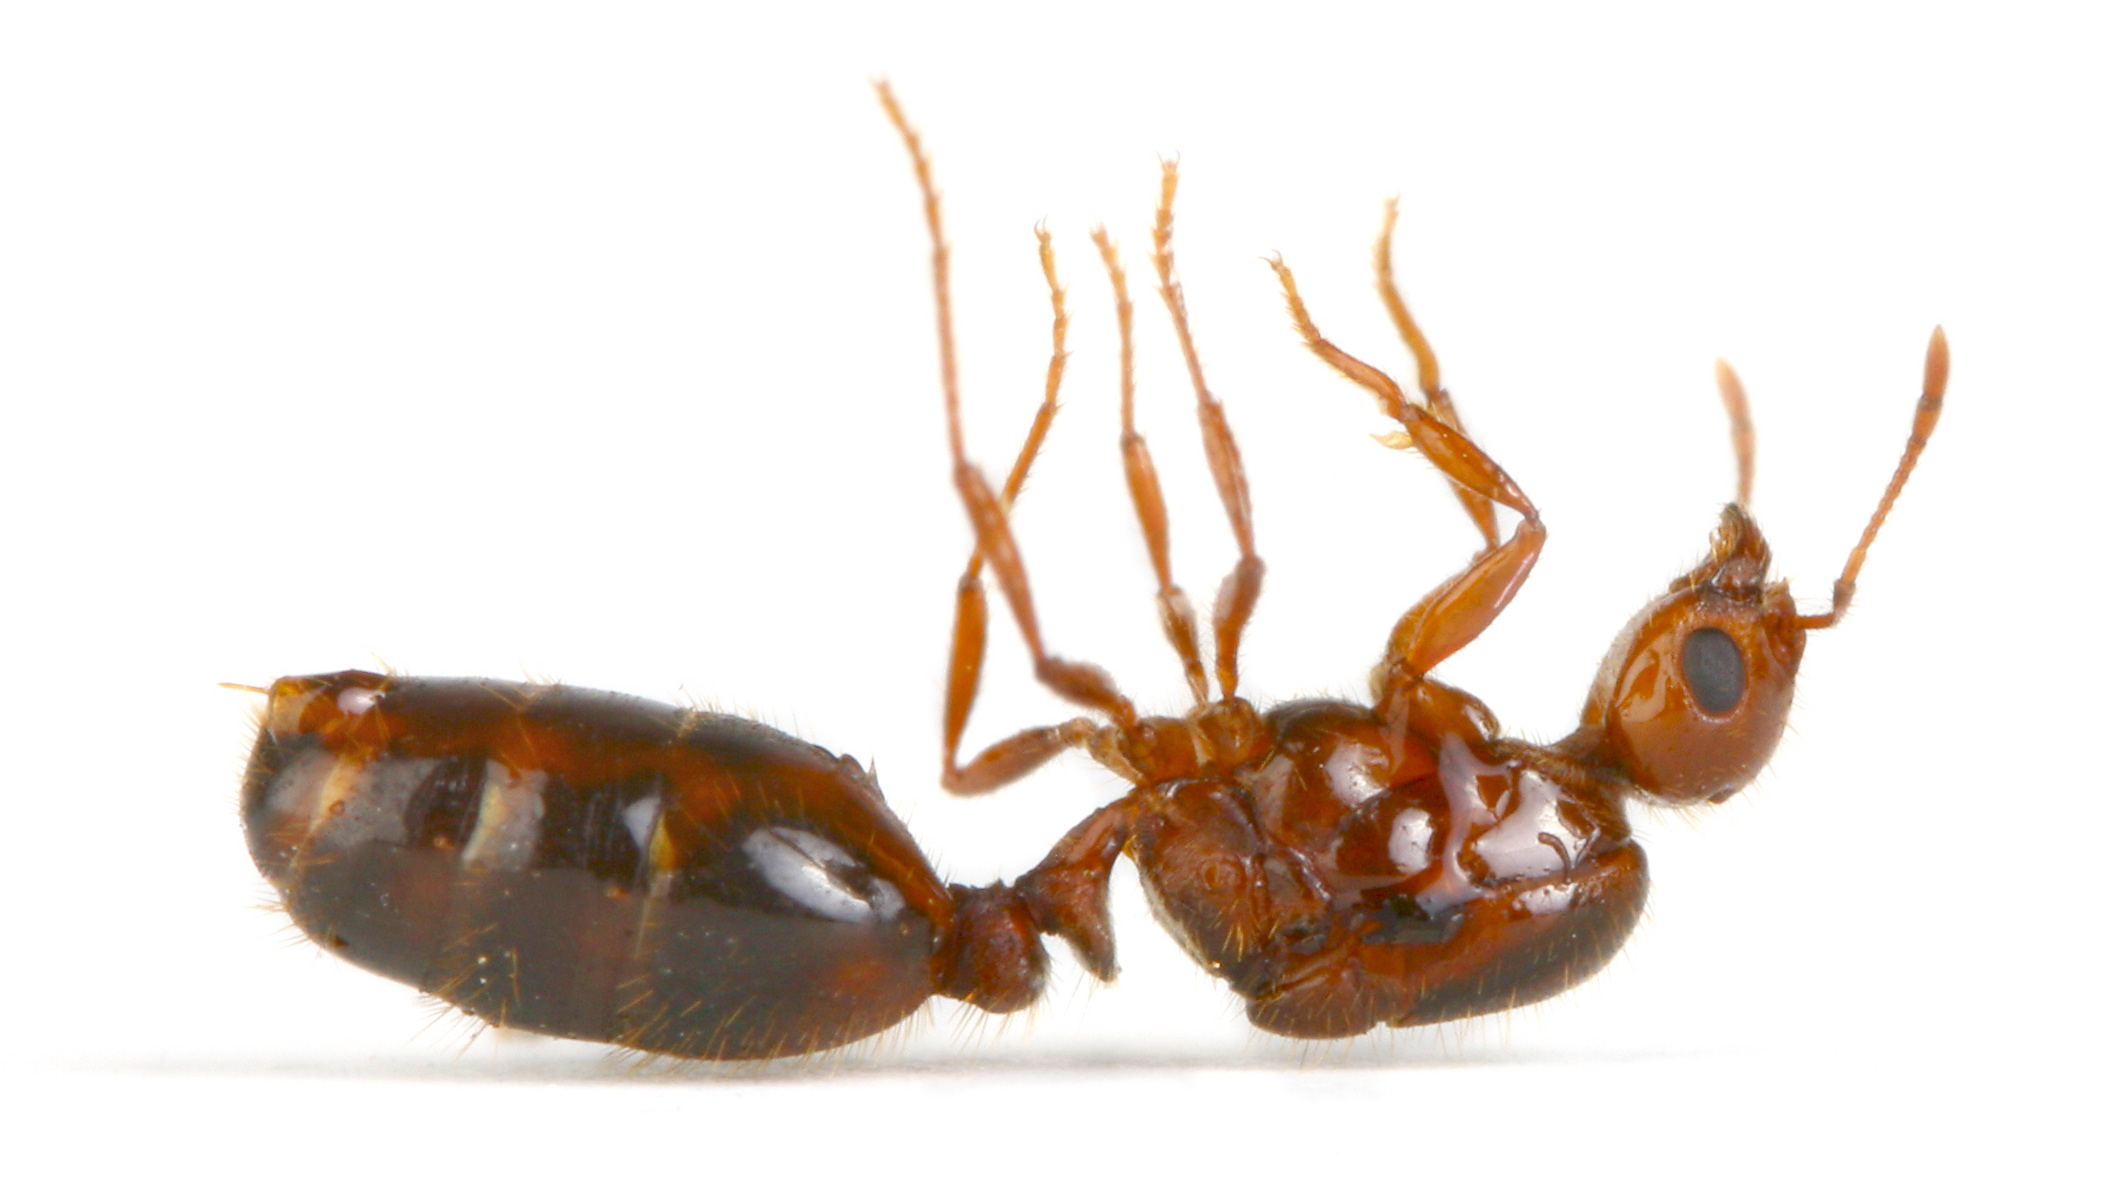 Sleeping Dead Fire Ant Queen